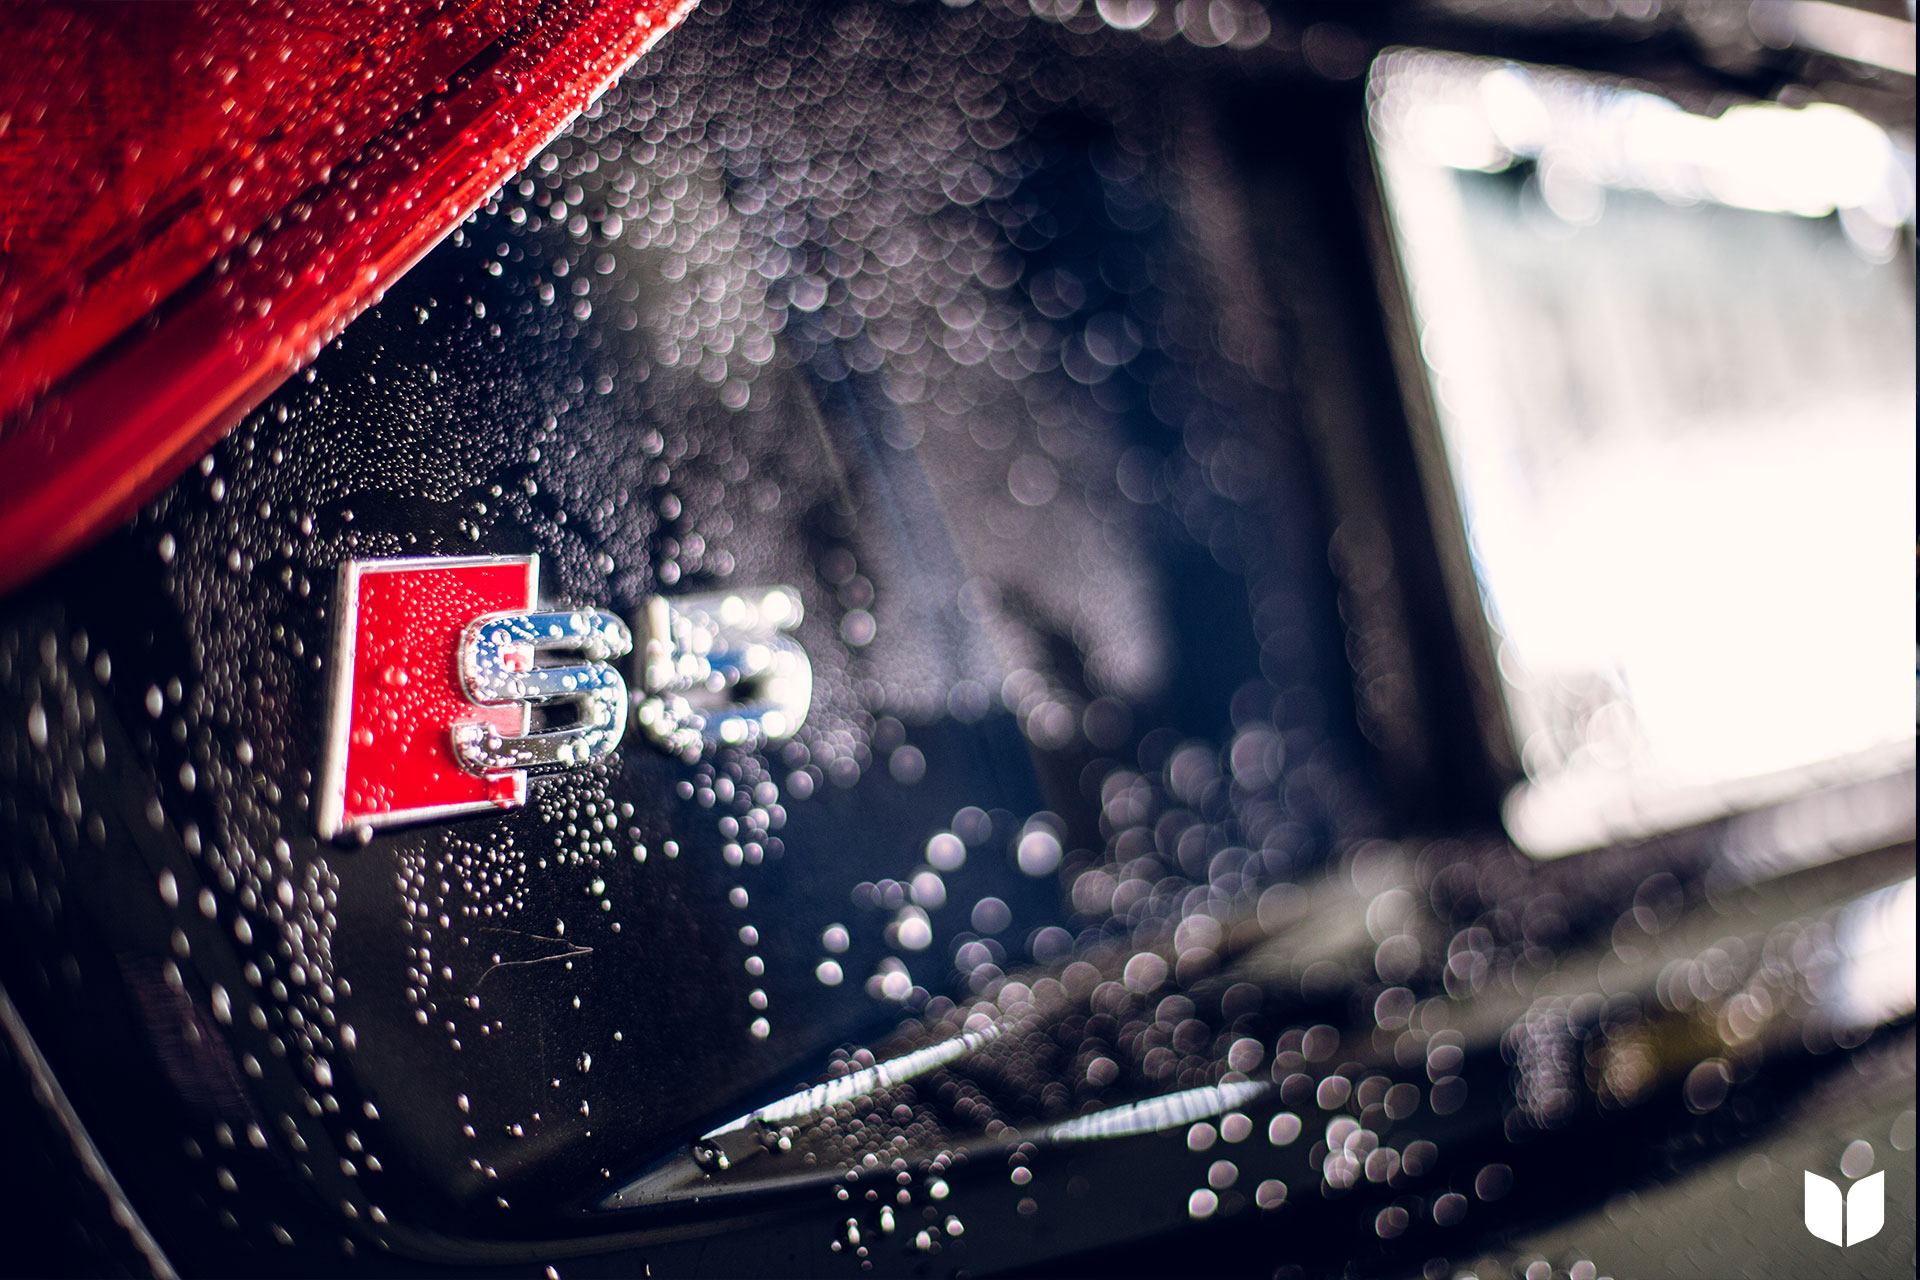 Audi B8 S5 receiving a bath before the final client presentation